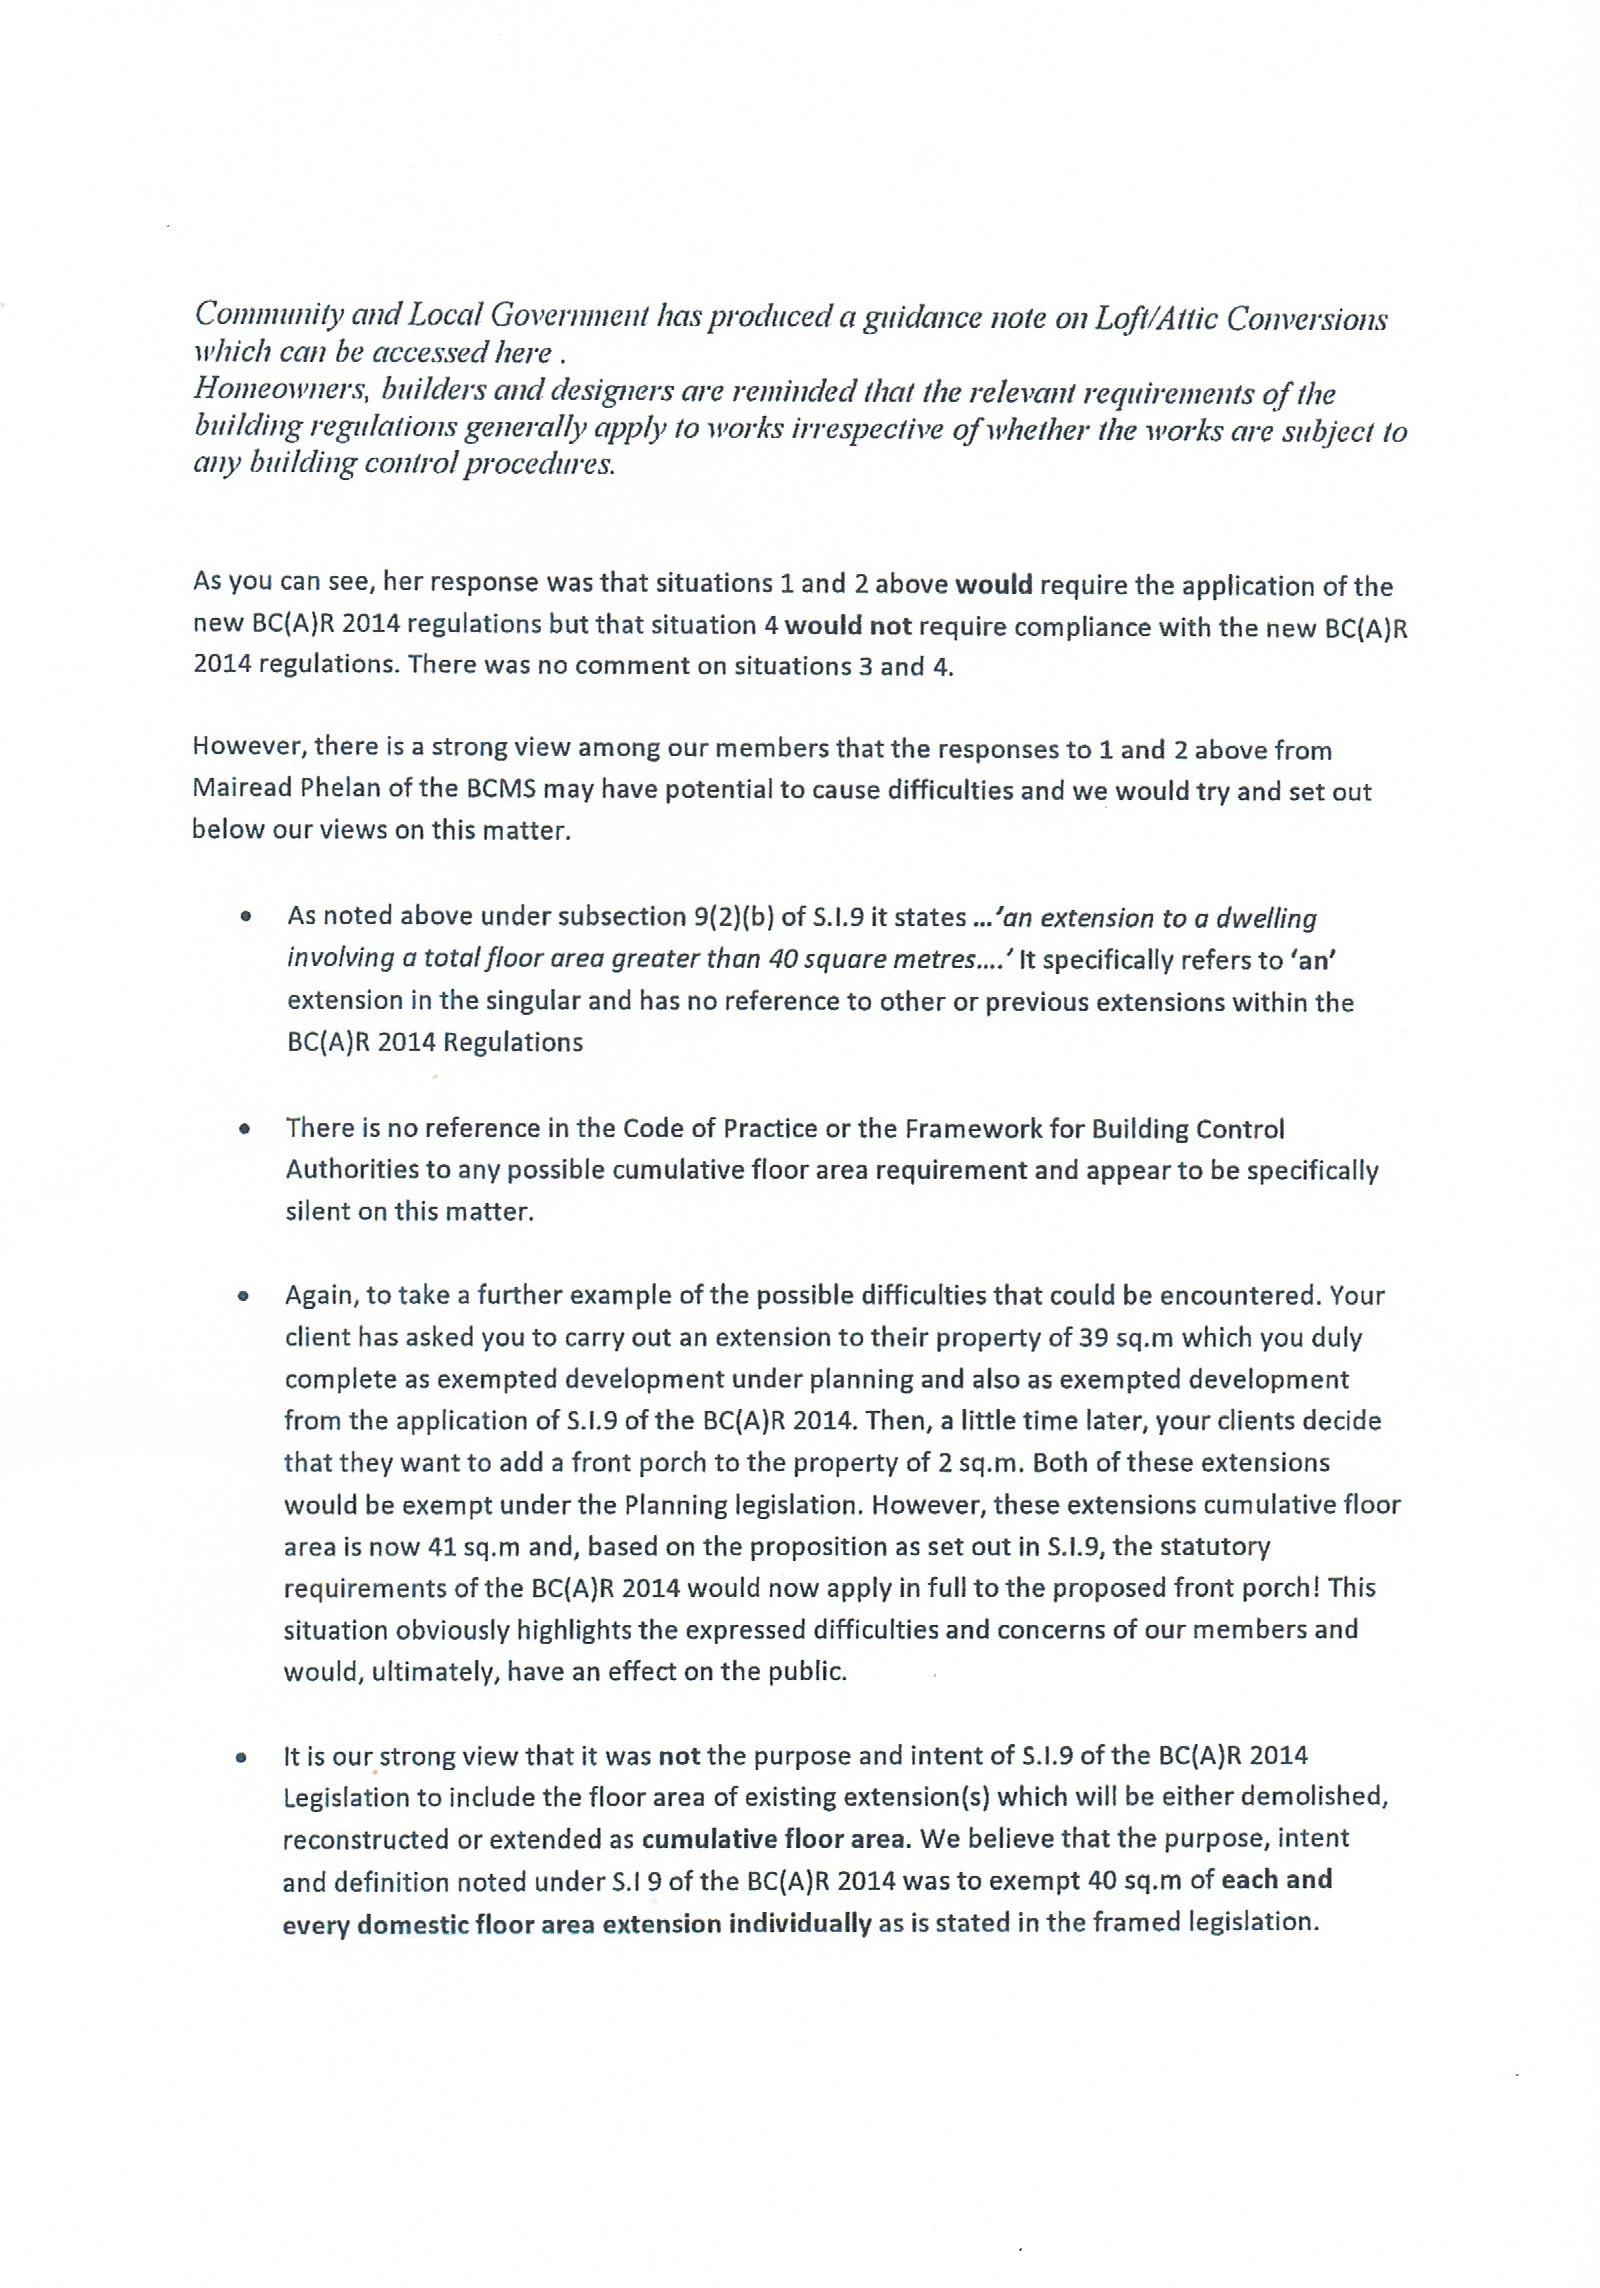 Riai Practice News 40sqm Bc A R Si 9 Exemption Bregsforum